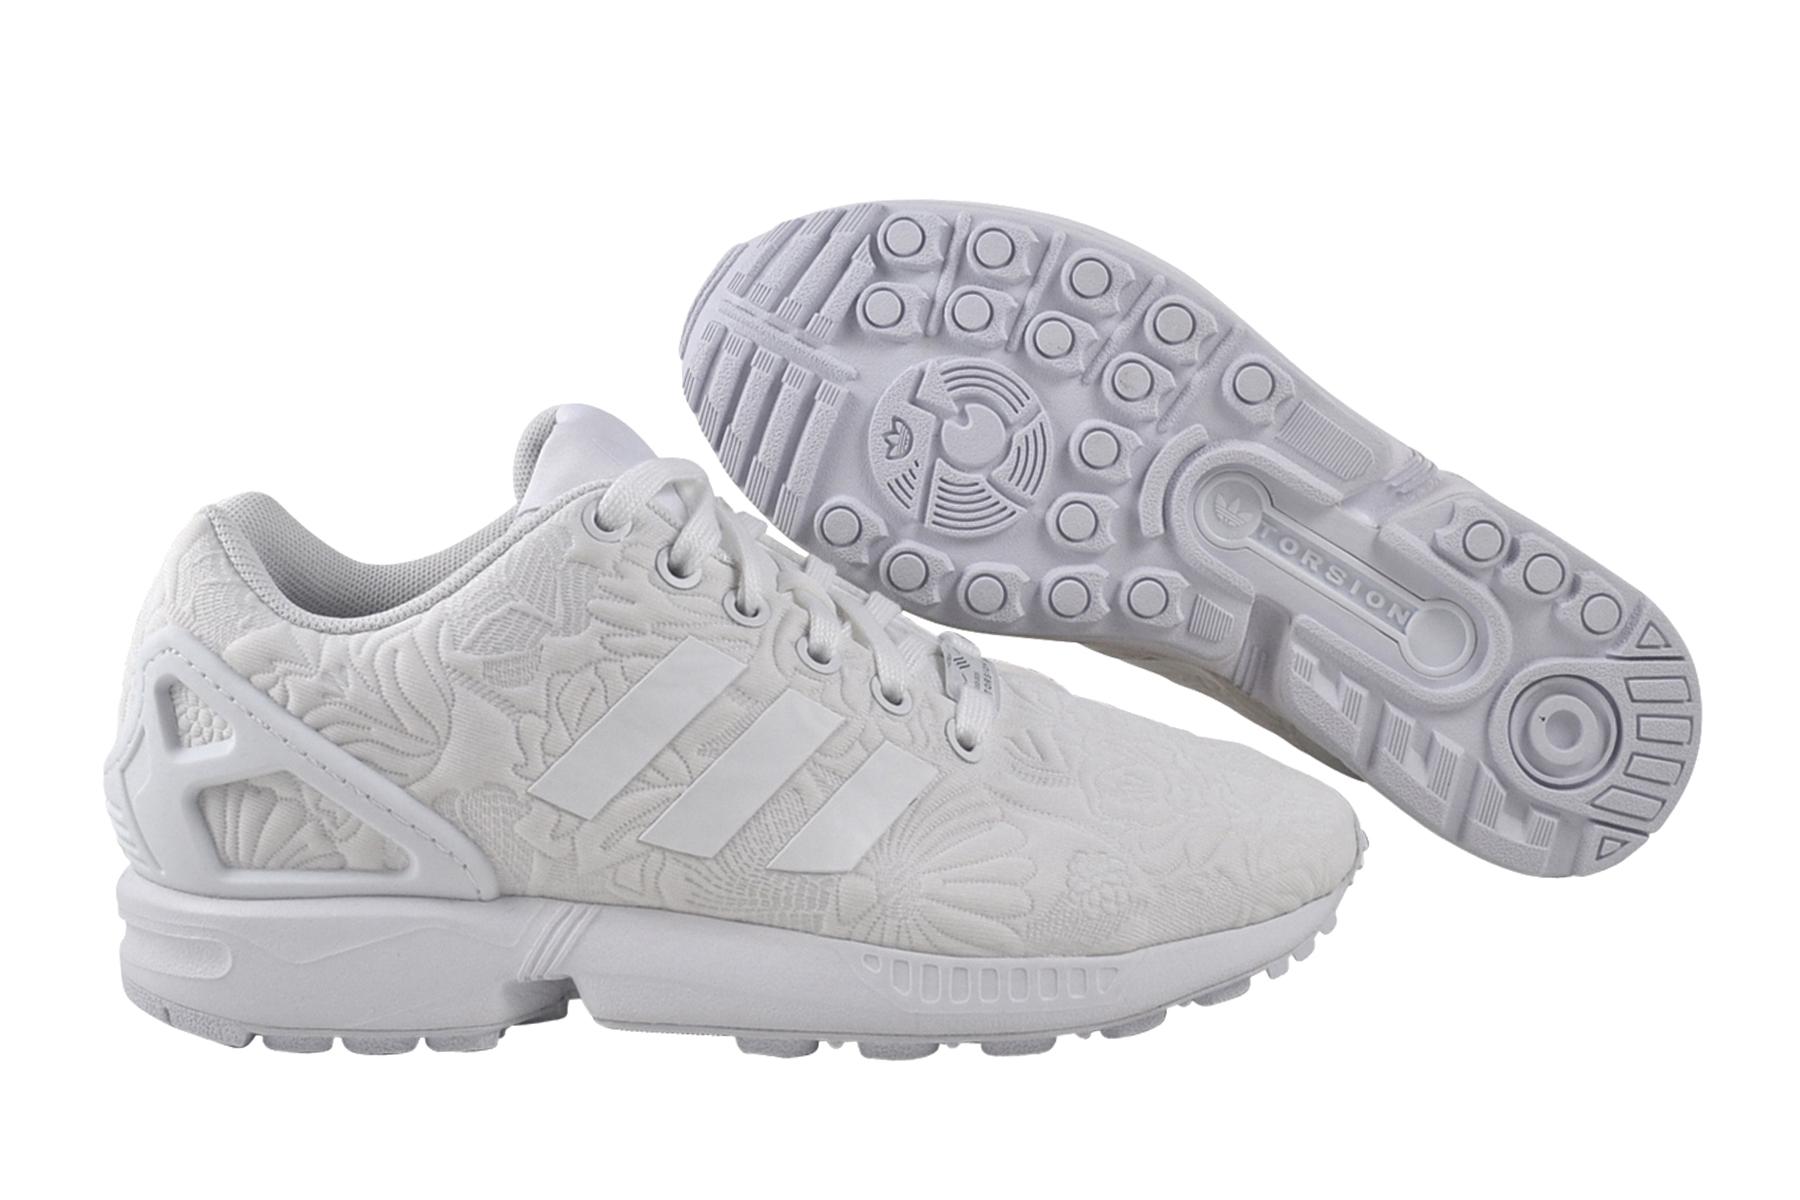 Dettagli su Adidas Zx Flux Donne White Black Scarpa da Ginnastica Bianca S76590